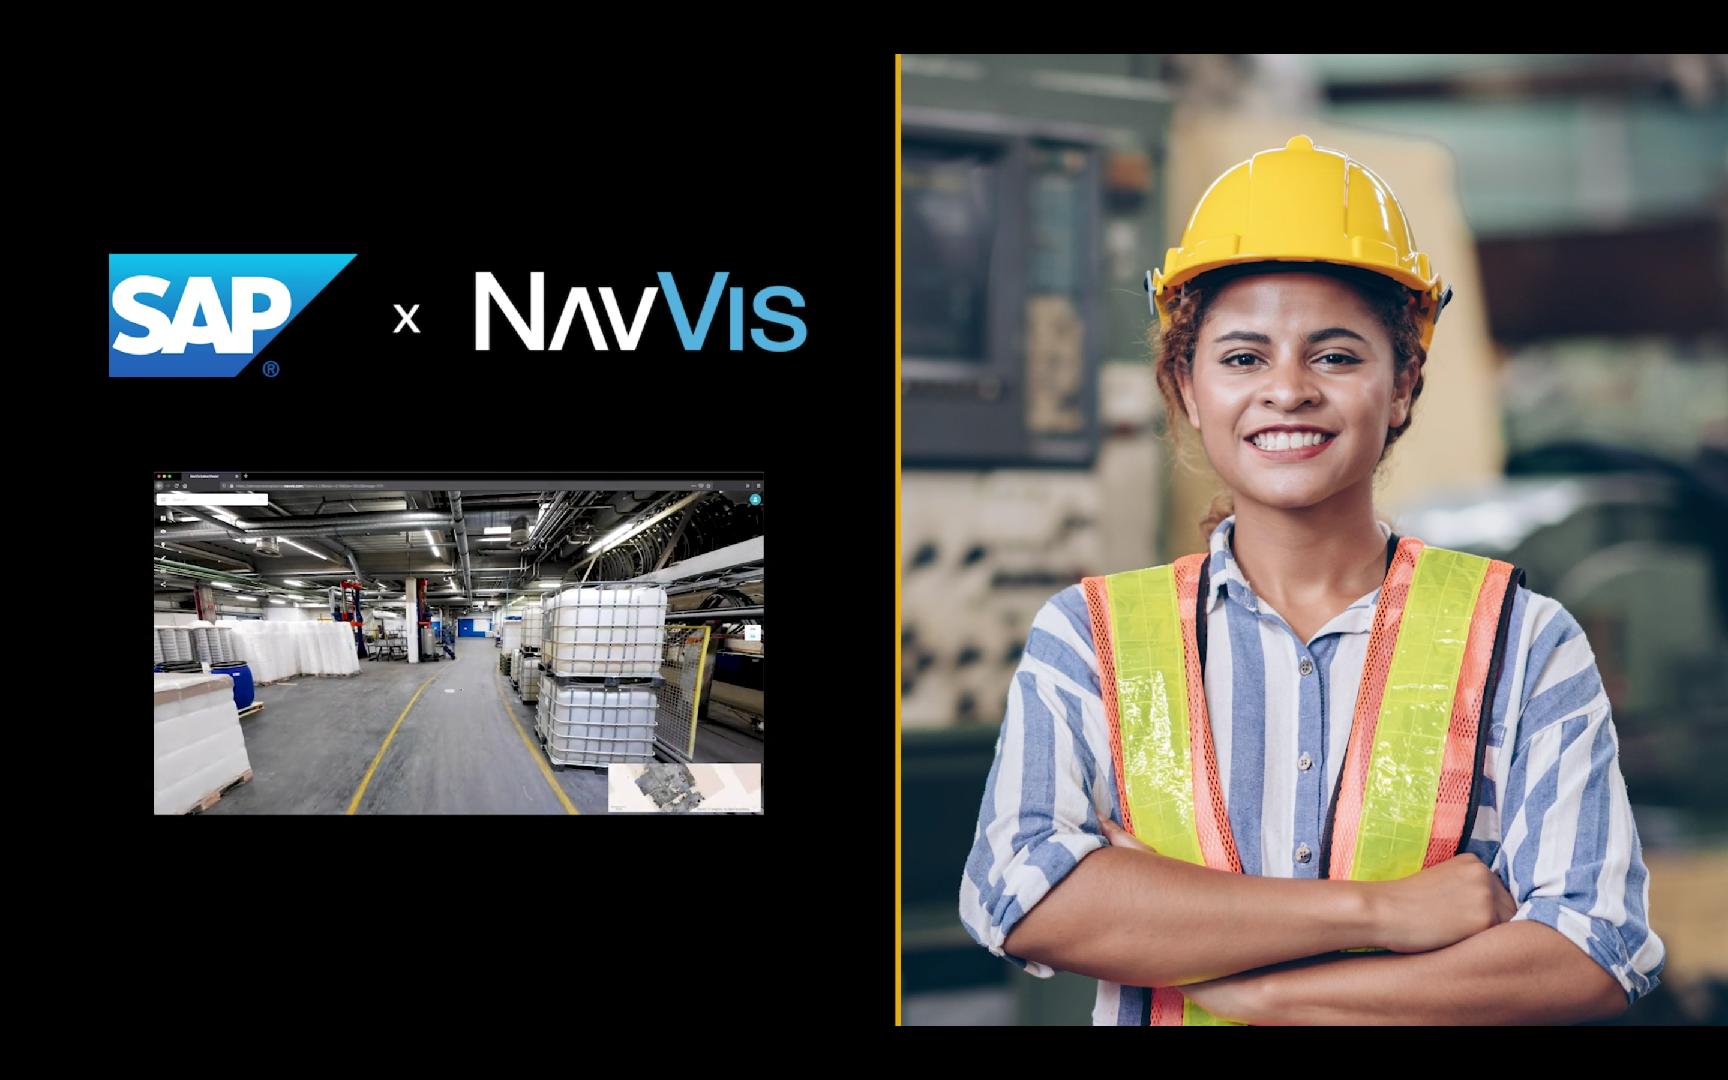 SAP x NavVis Mission Unstoppable